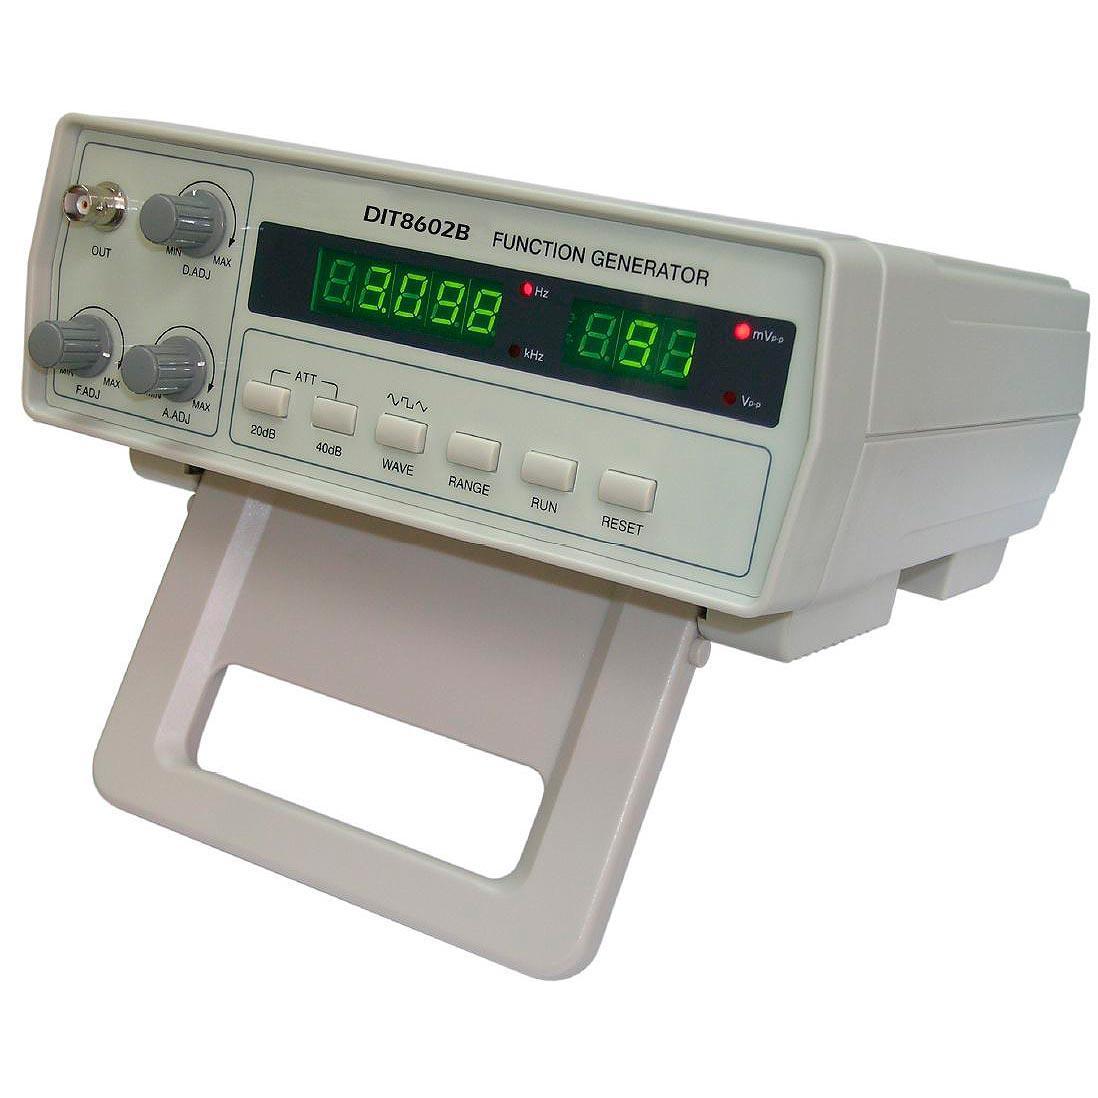 generador de funciones DIT-8602B